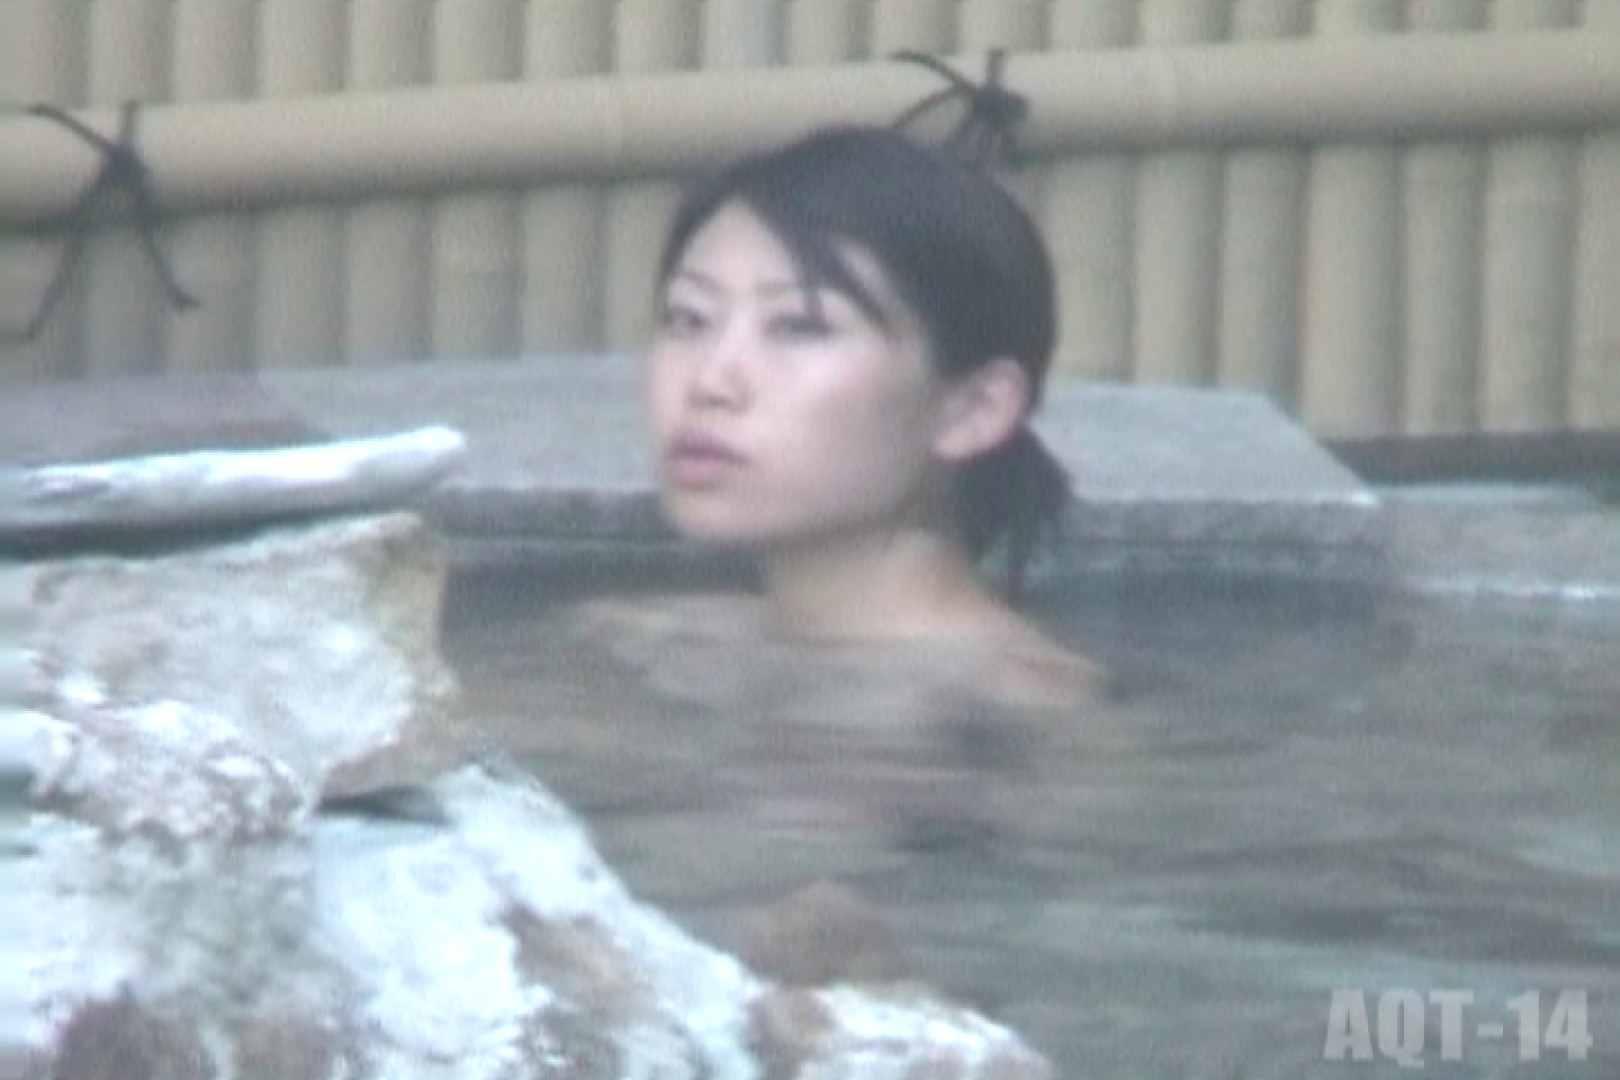 Aquaな露天風呂Vol.820 盗撮師作品  104pic 12